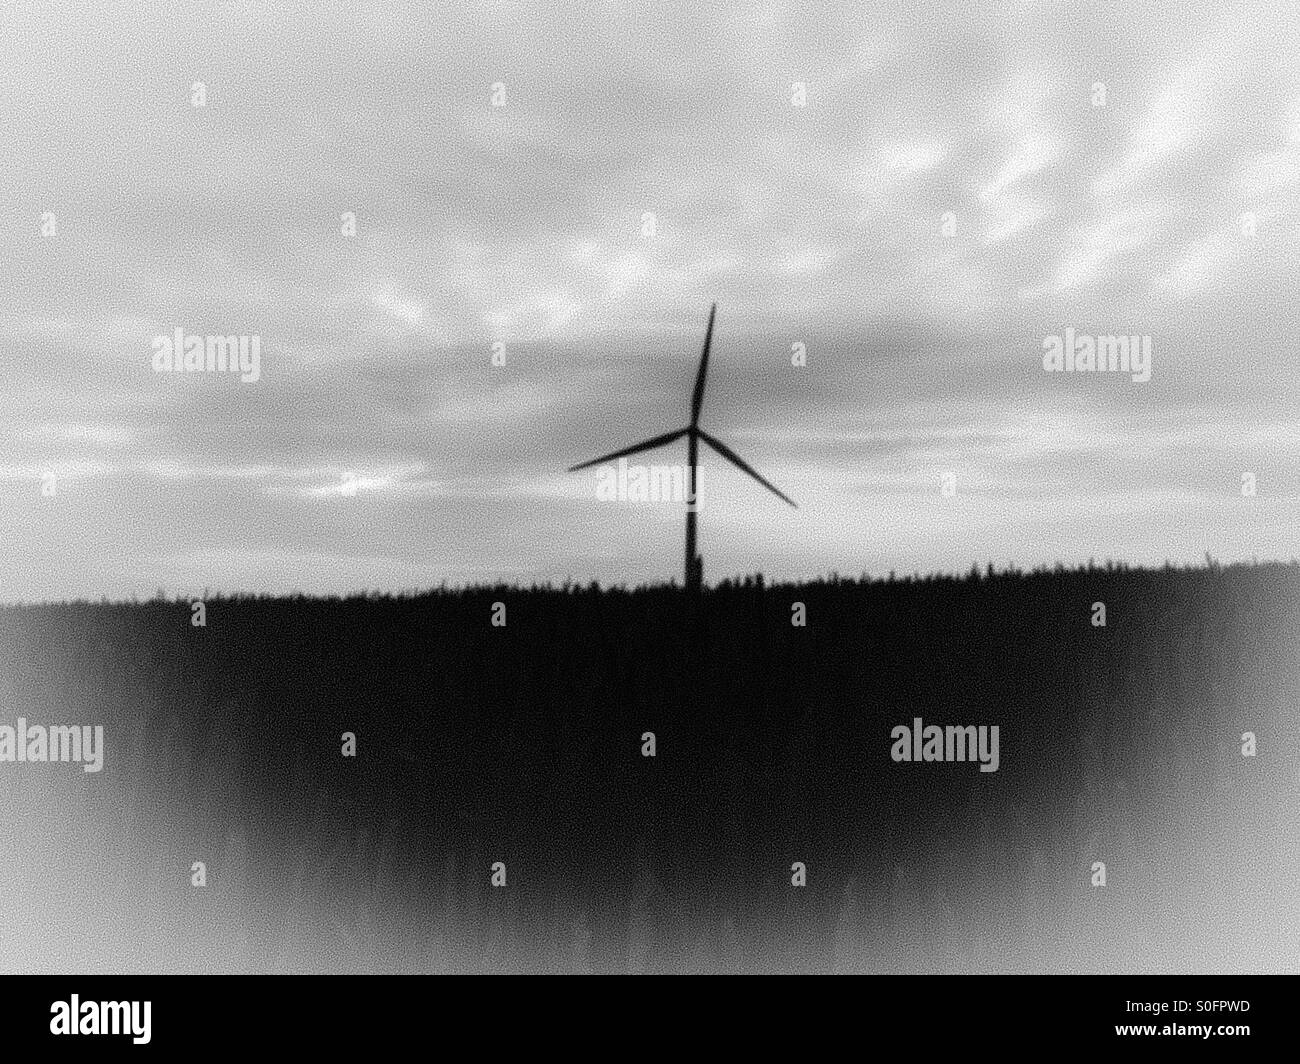 Wind turbine in field of wheat - Stock Image